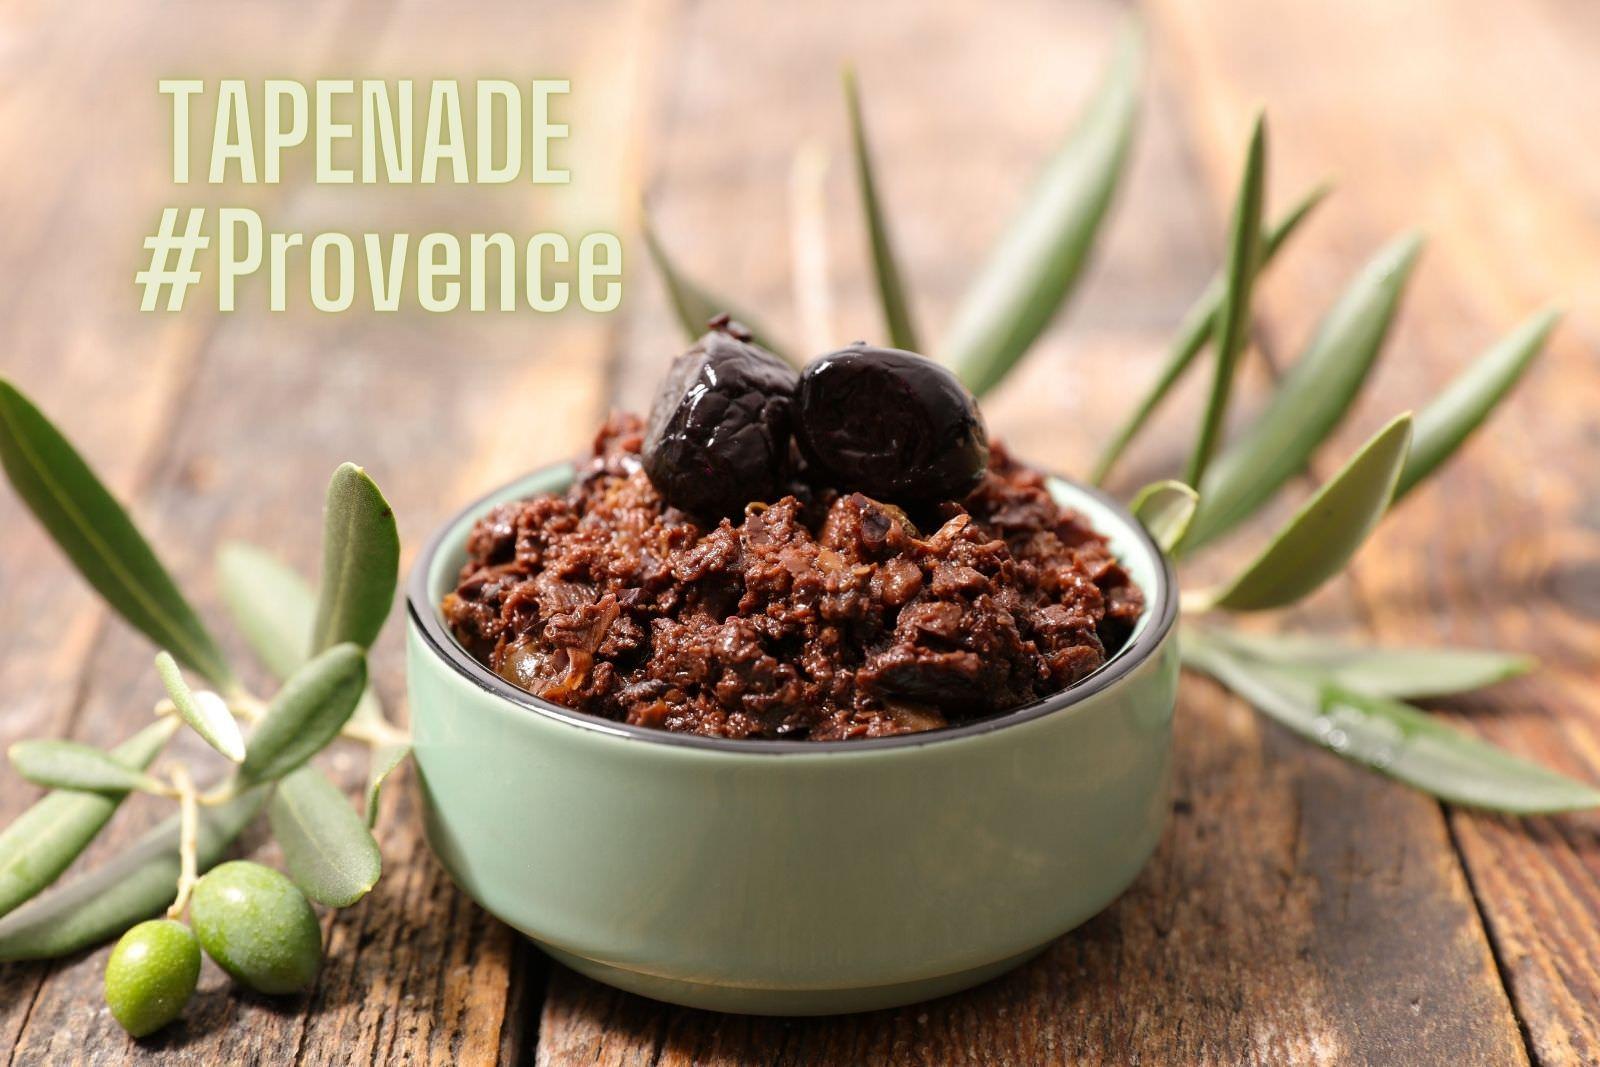 Tapenade: Rezept aus der Provence zum Selbermachen - Vielweib on Tour